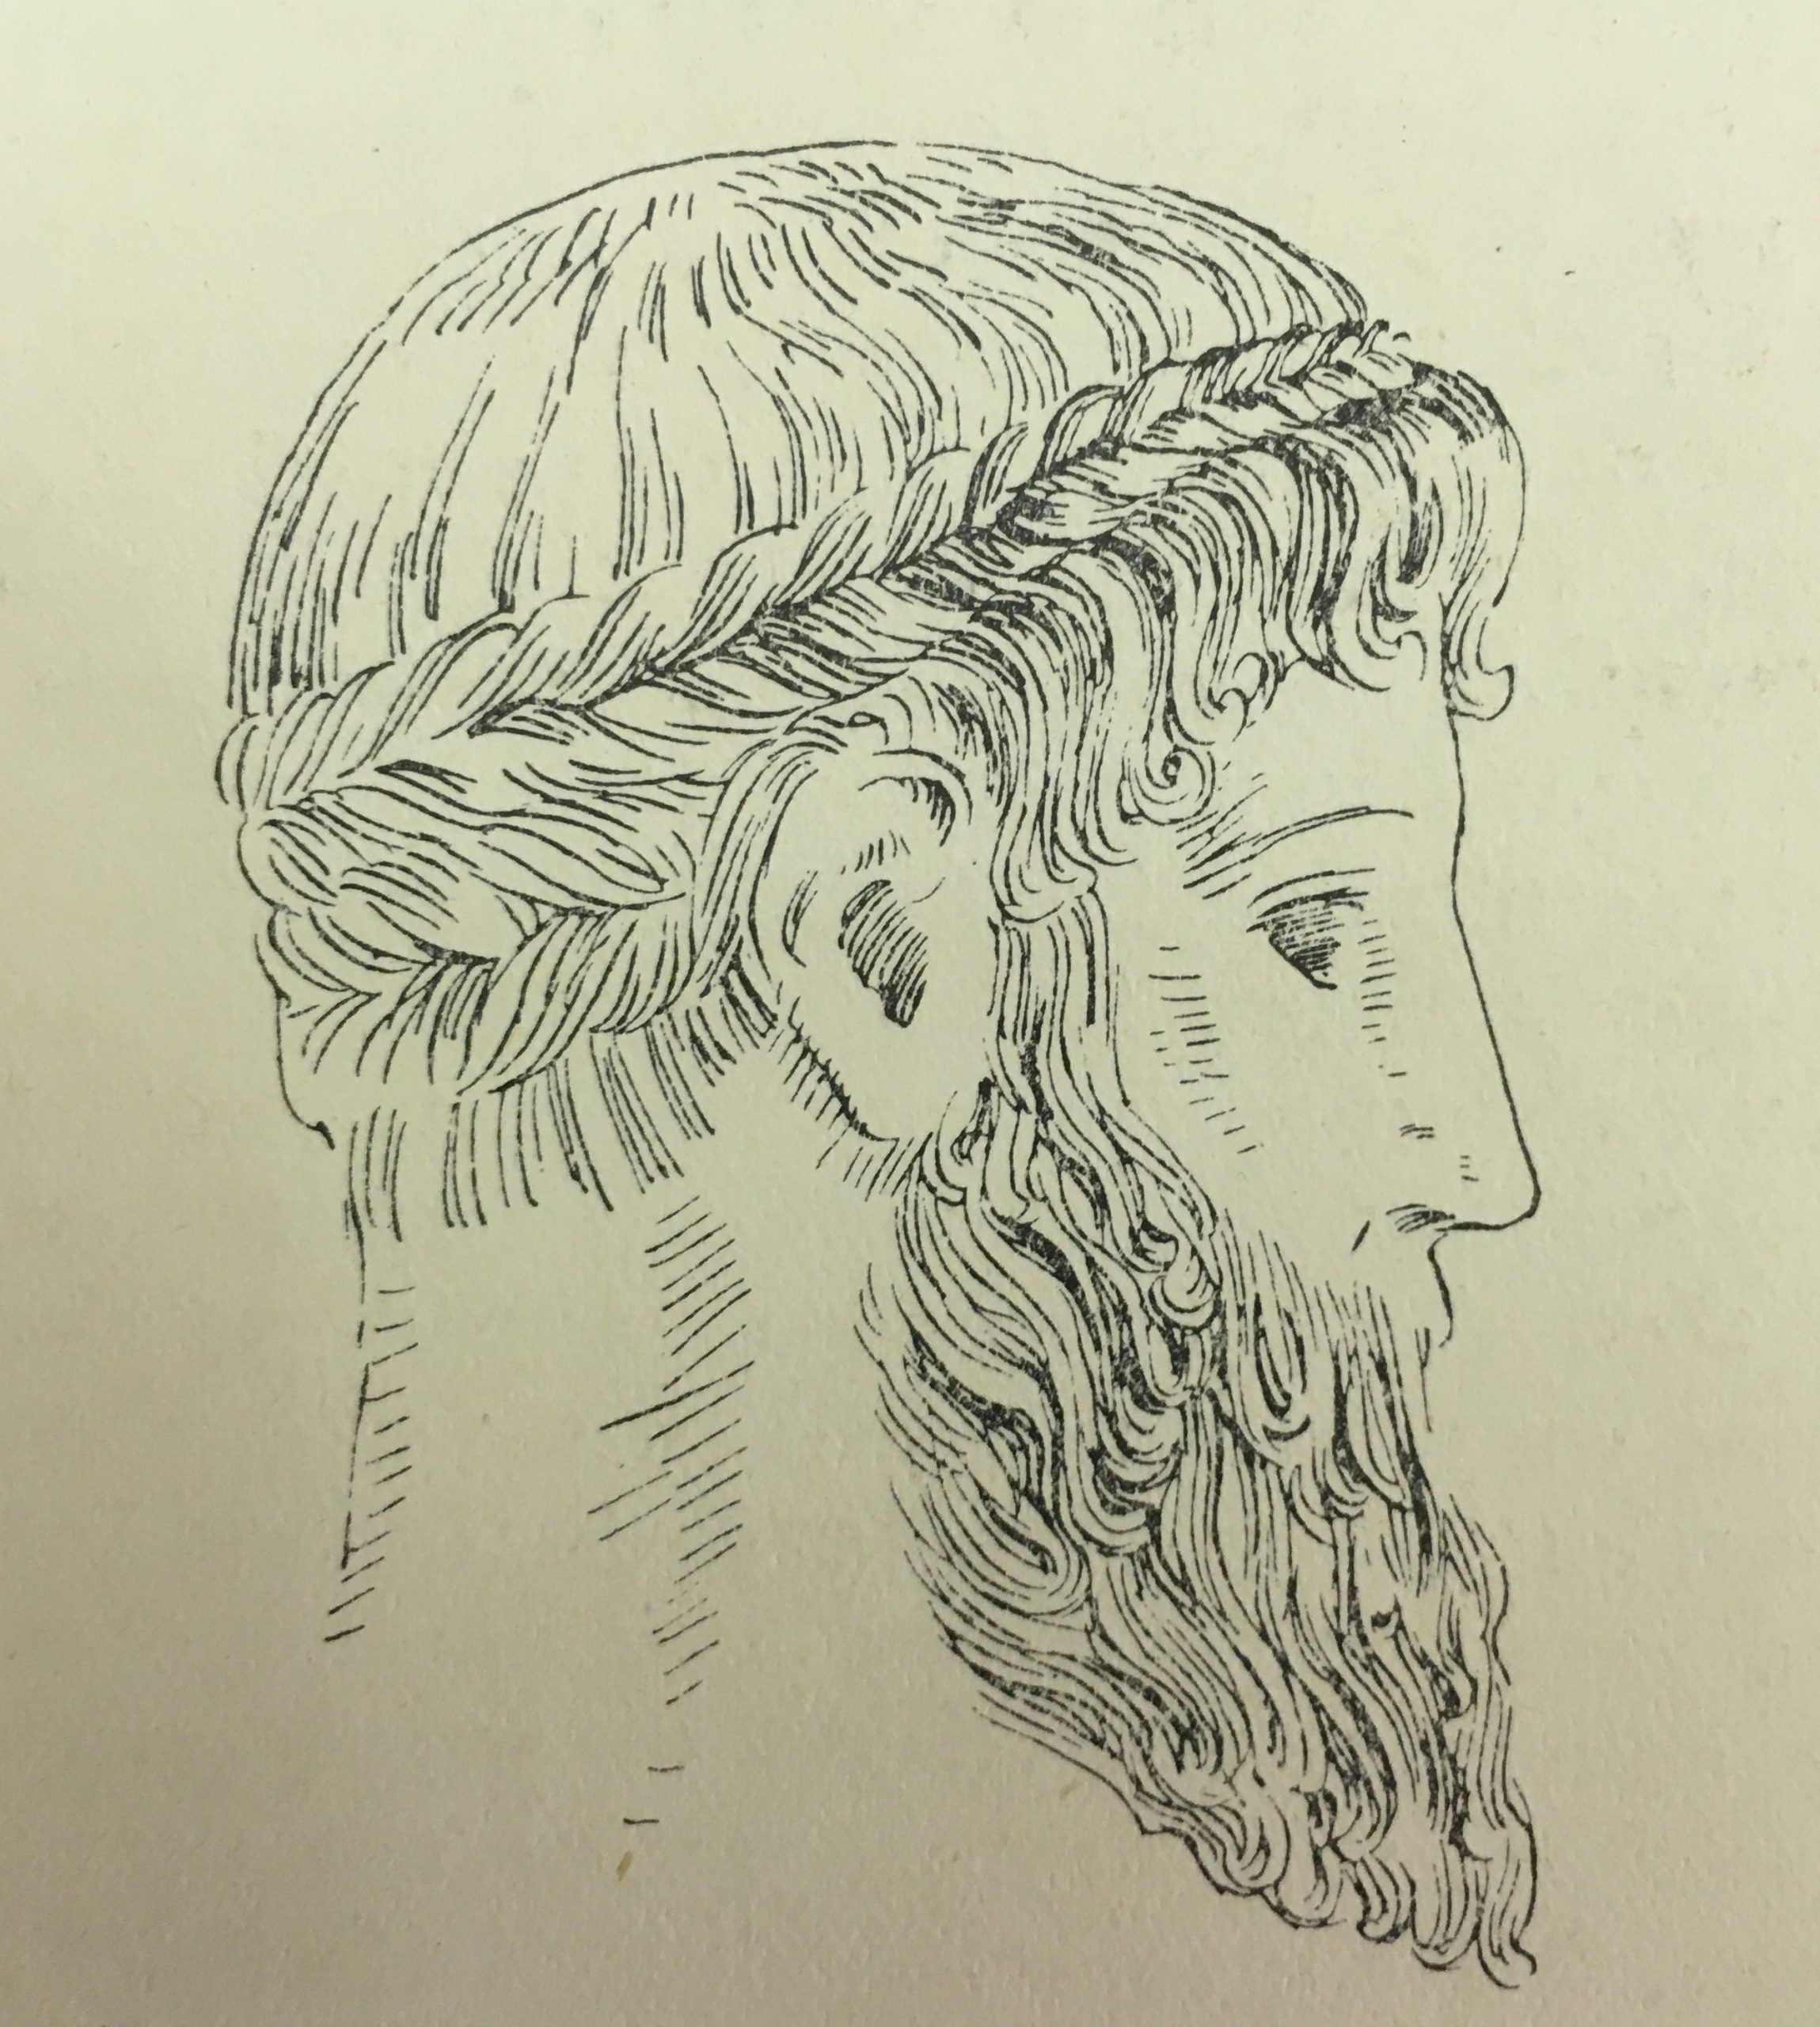 Allen Seaby, Leon of Massalia, Chapter 18: The Bronze Artemis